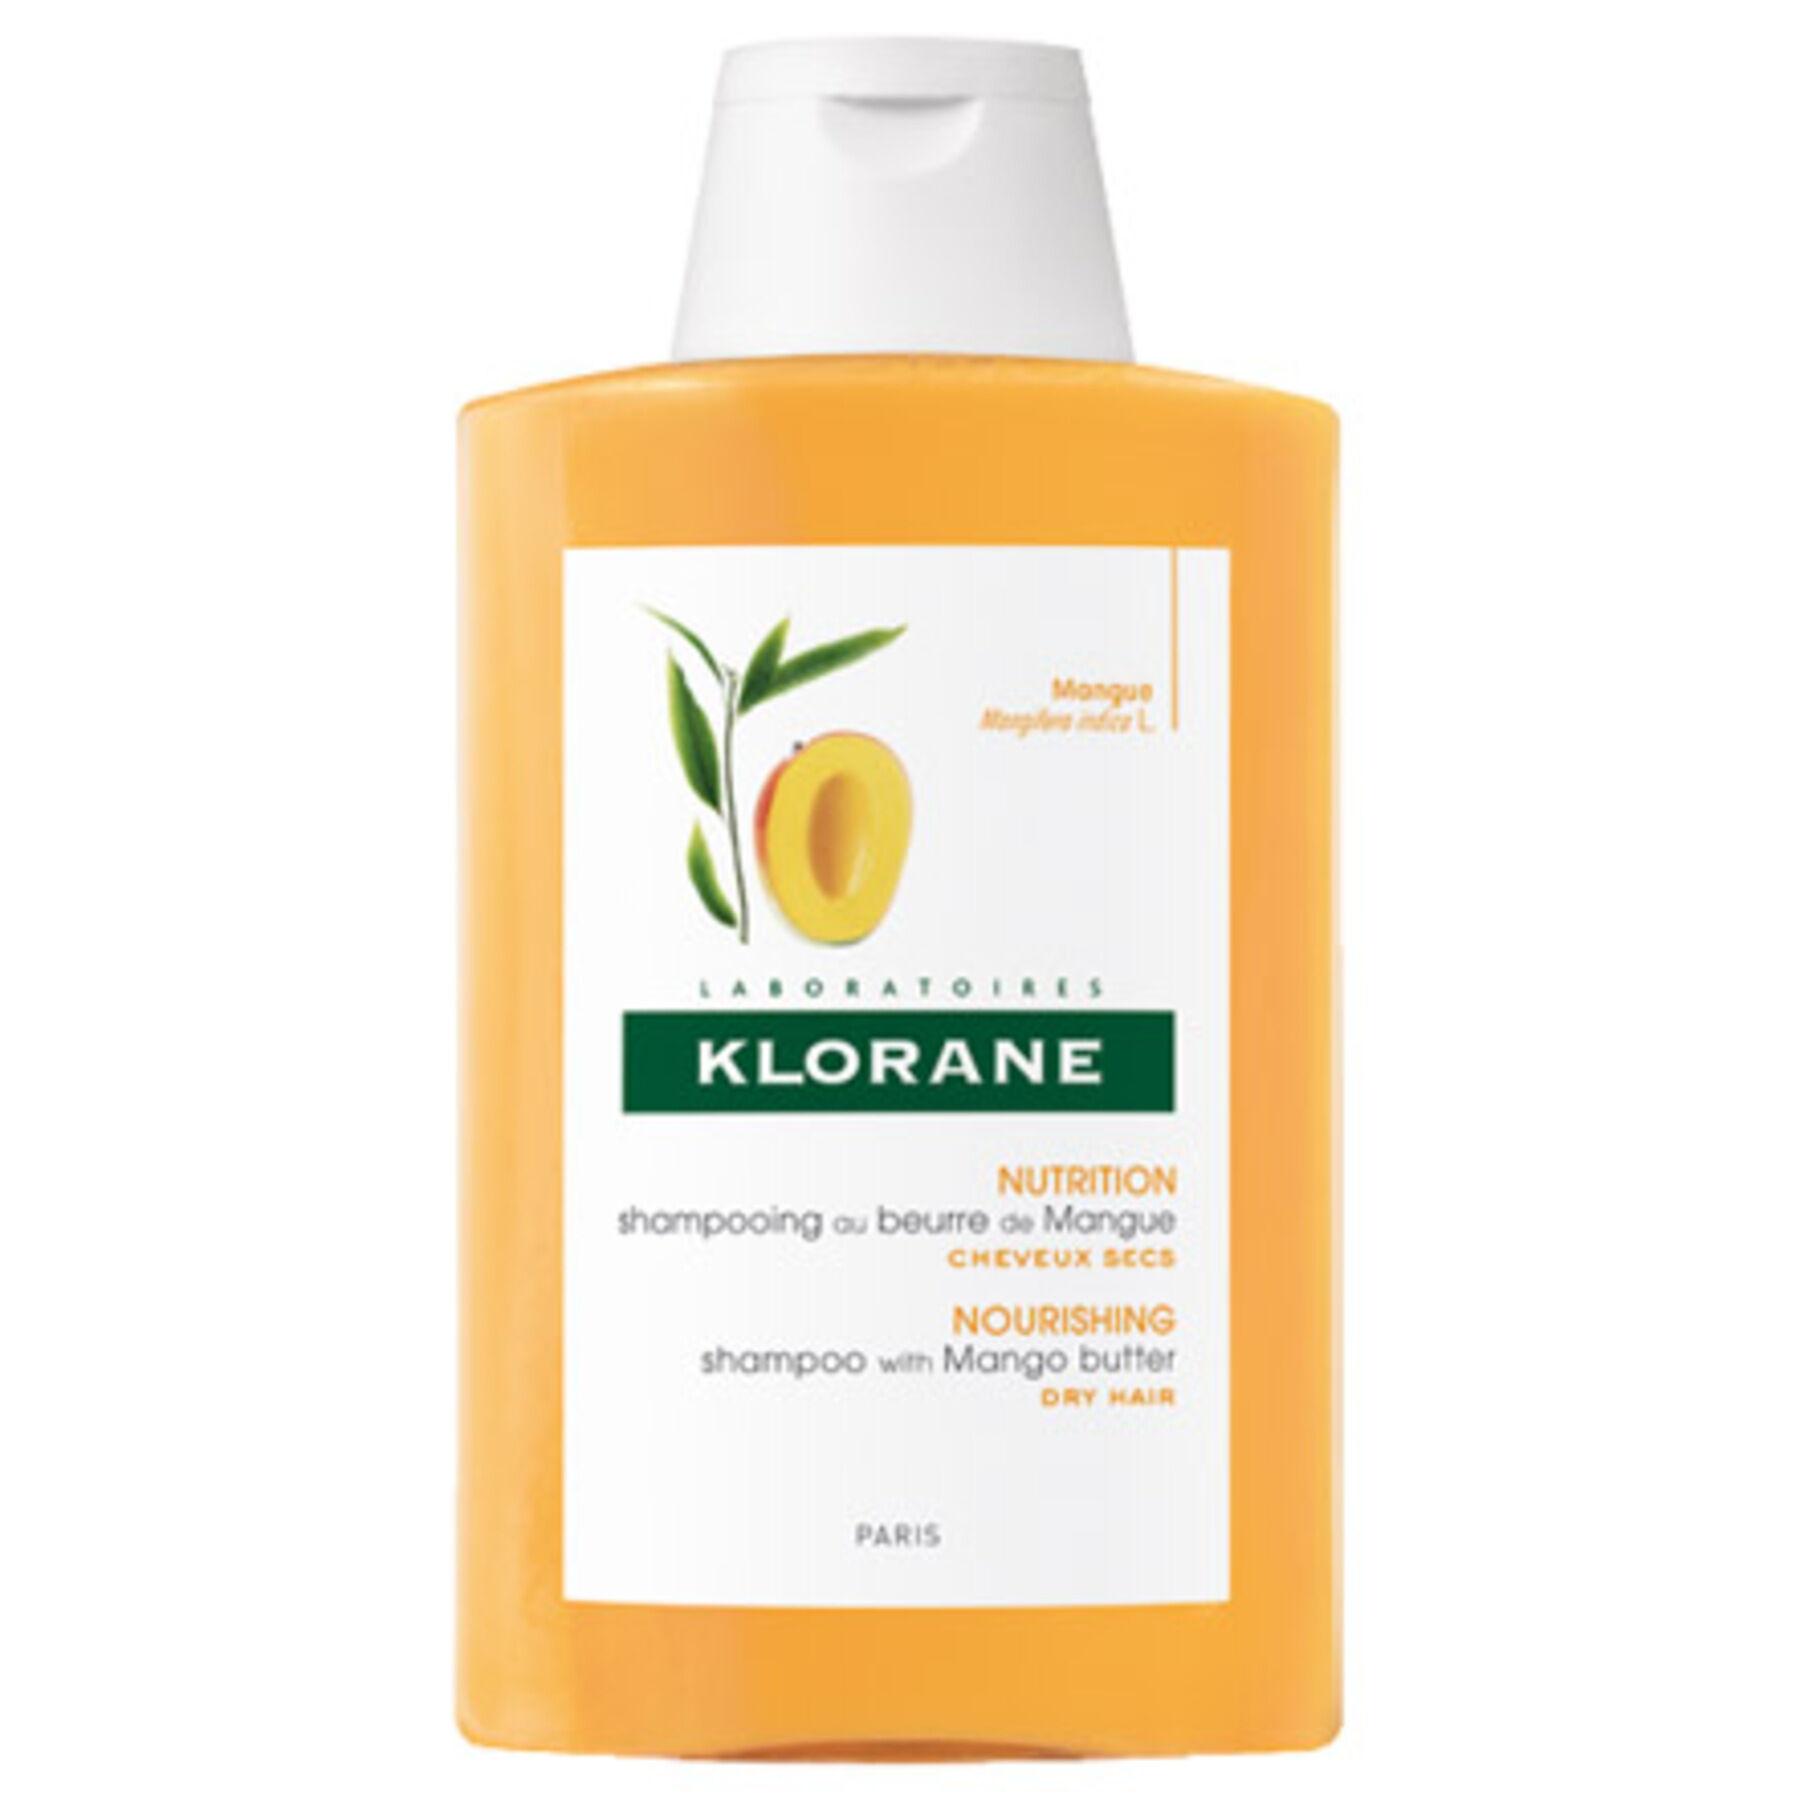 KLORANE (Pierre Fabre It. SpA) Klorane shampoo al burro di mango 200 ml